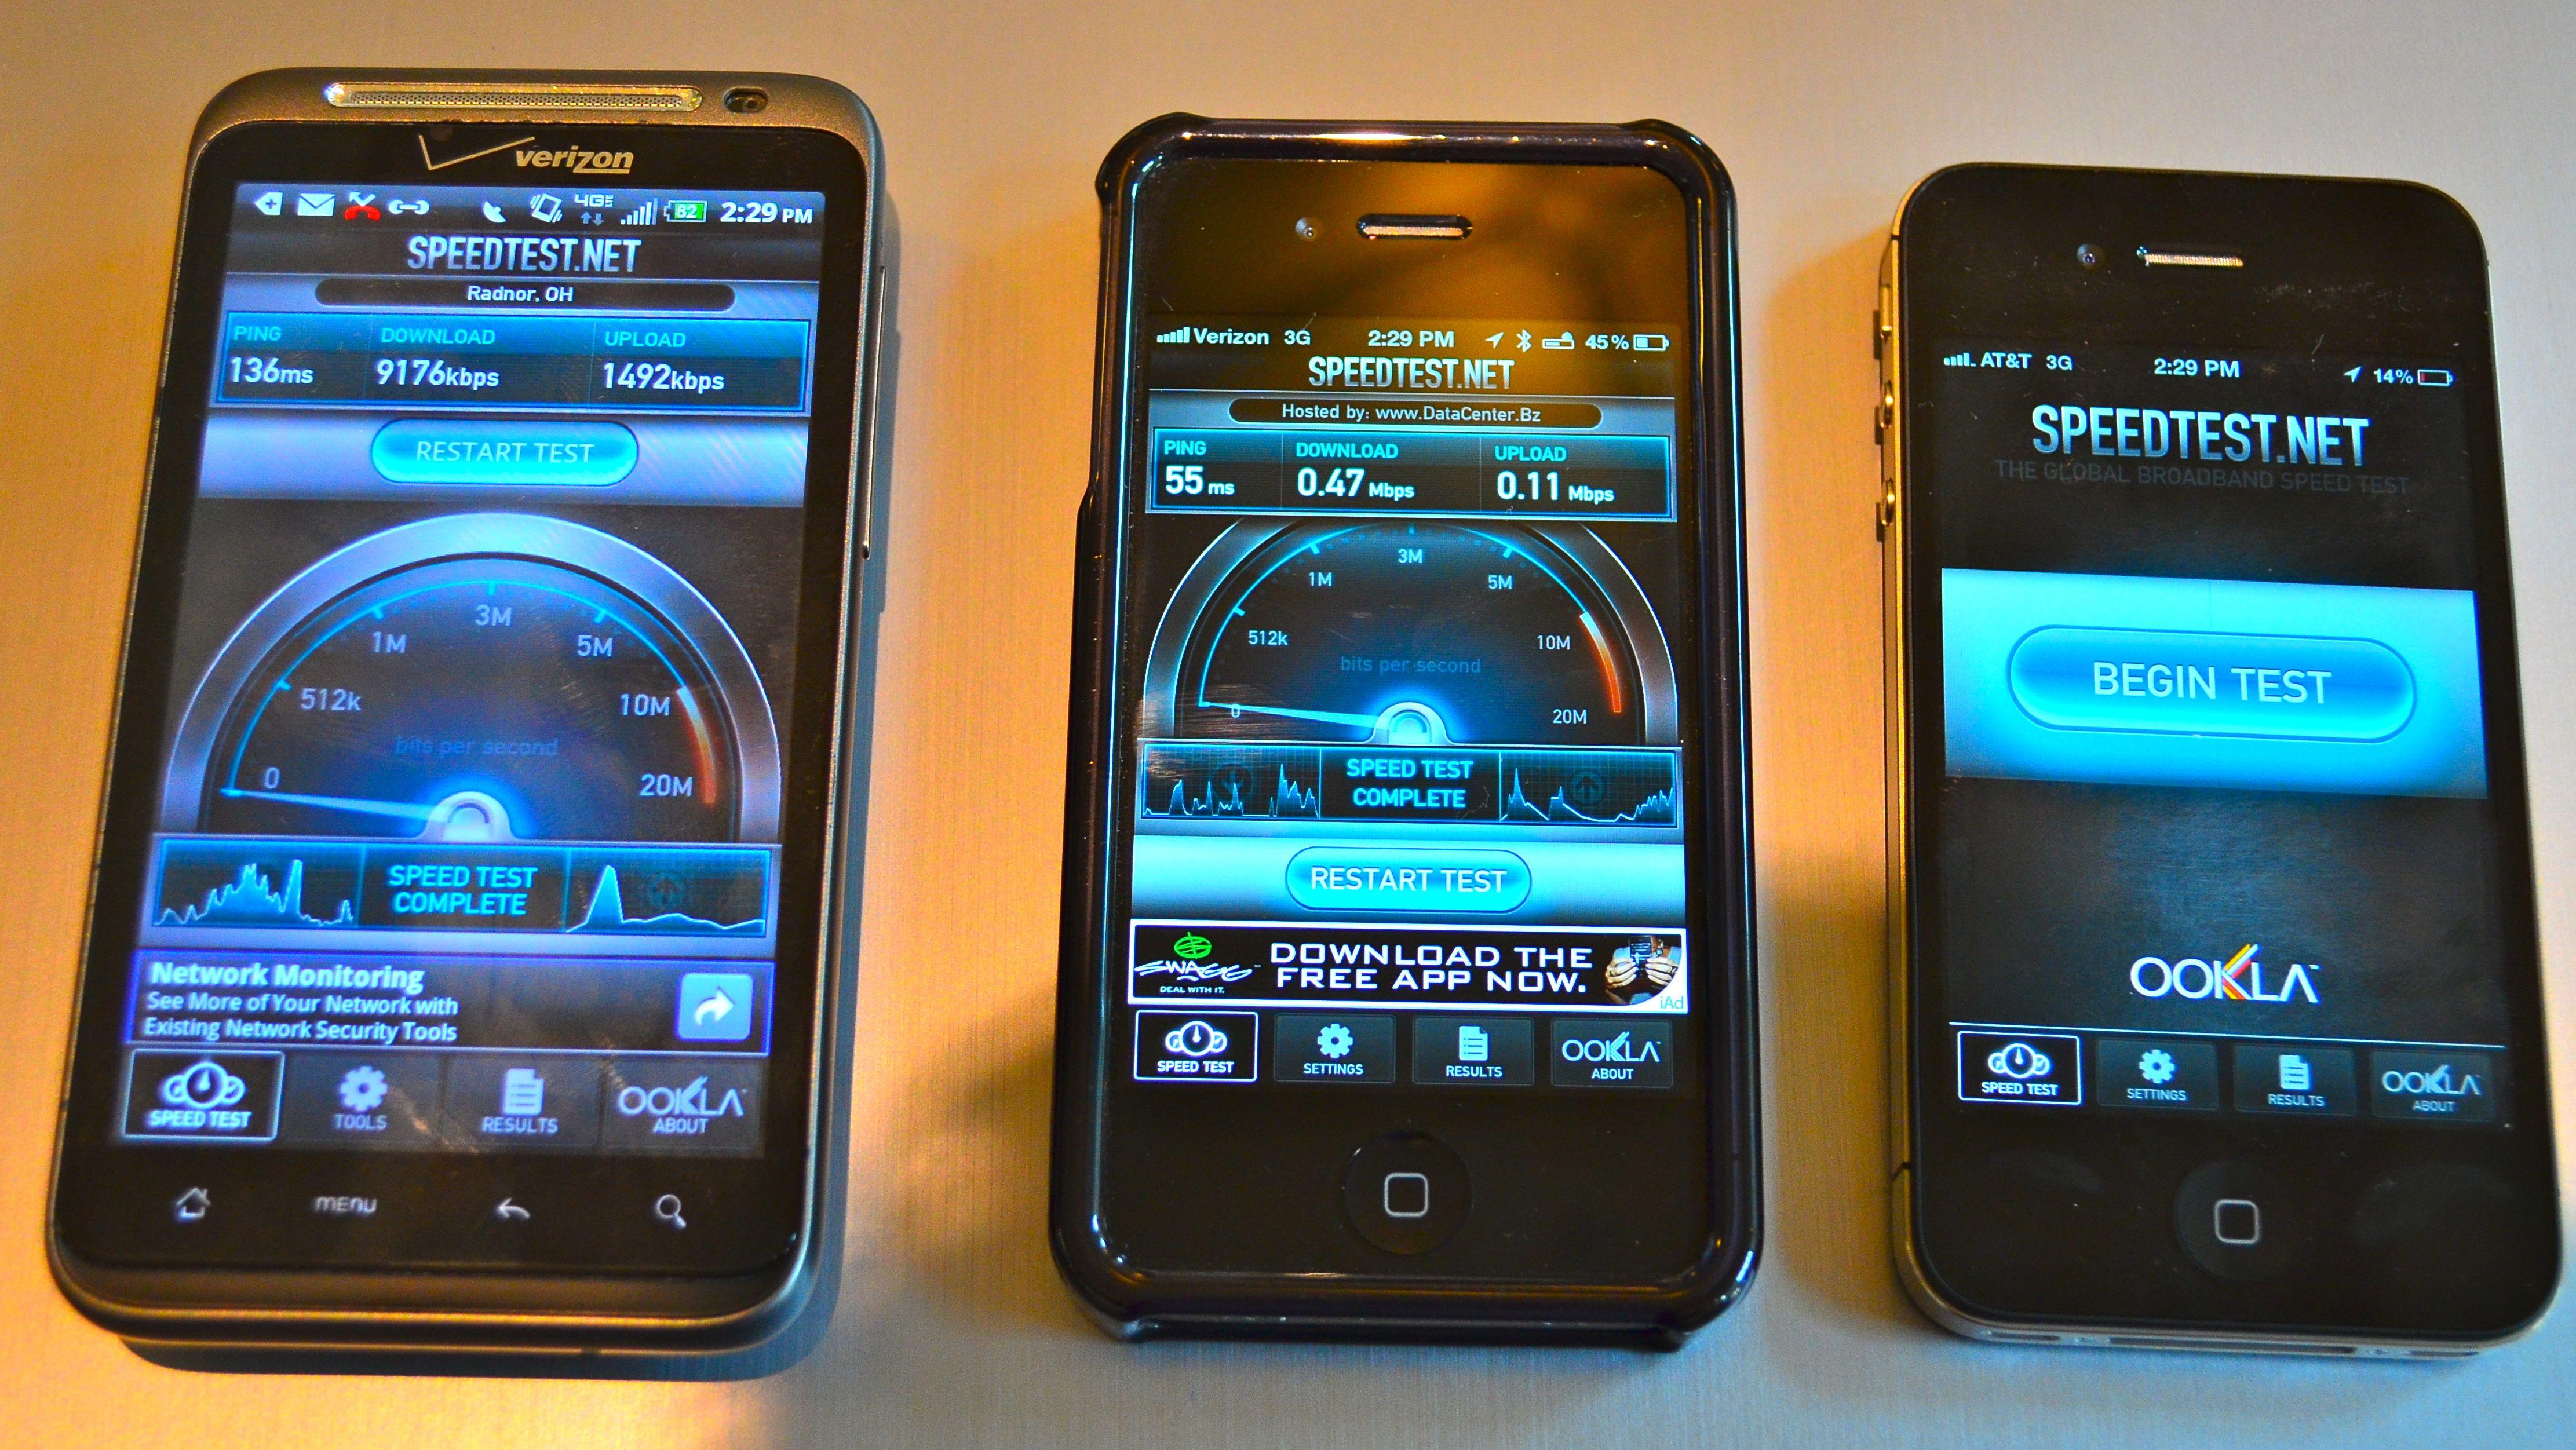 iphone 4s speedtest at t vs verizon vs verizon 4g lte midwest. Black Bedroom Furniture Sets. Home Design Ideas